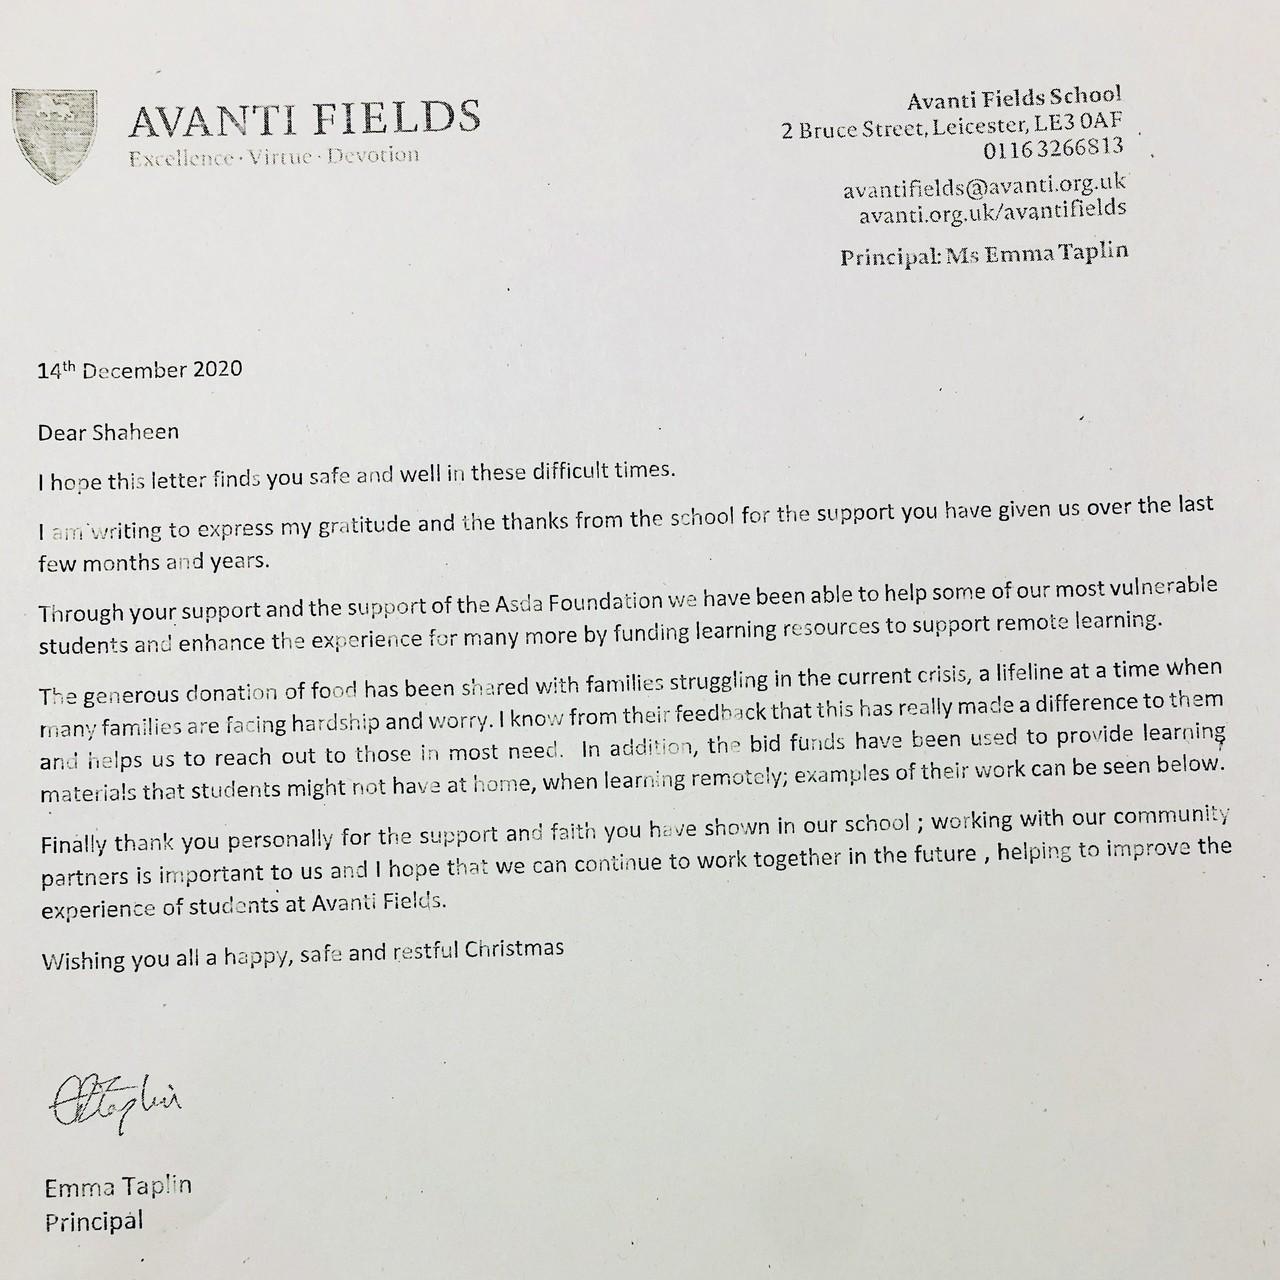 Thank you letter from Avanti Fields School | Asda Leicester Abbey Lane